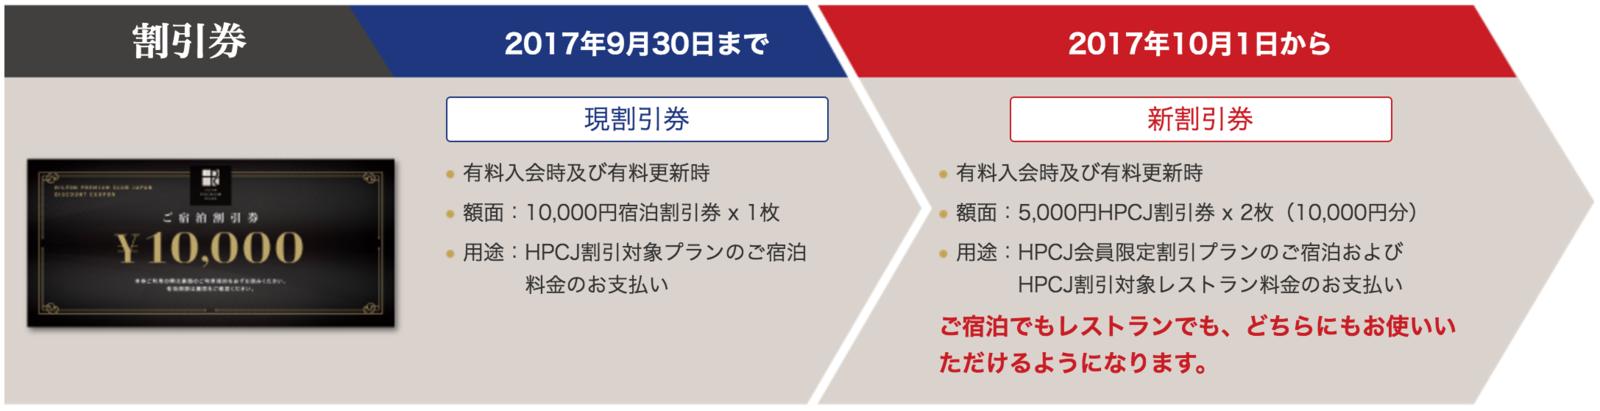 f:id:kanamalu:20170109005654p:plain